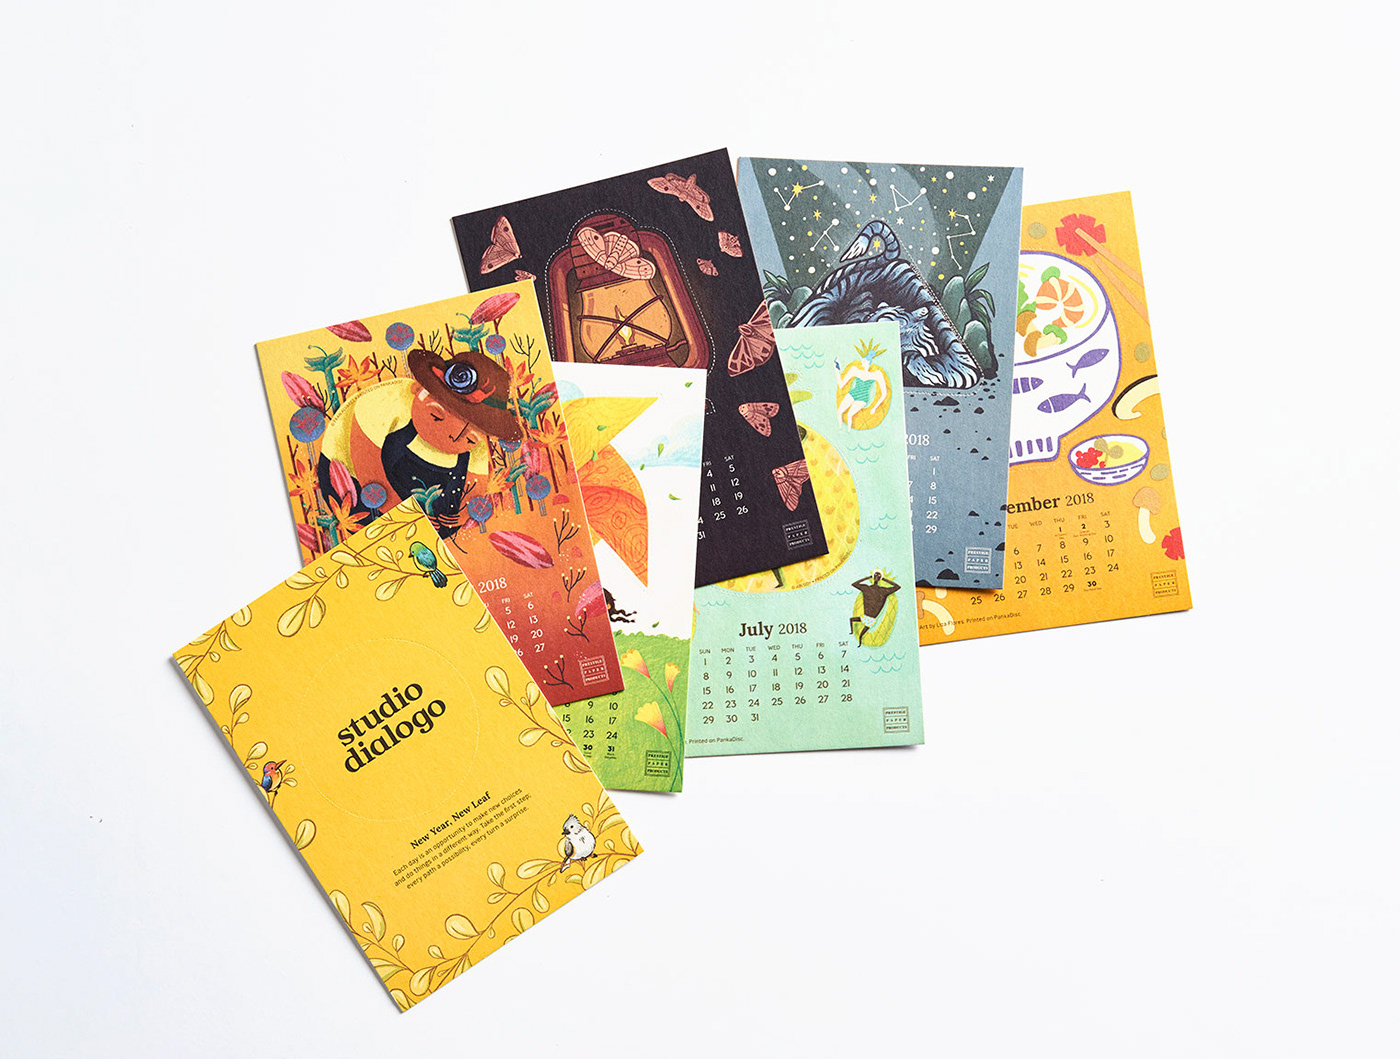 pankadisc reuse coaster calendar mermaids Pineapple prestigepaperproducts dialogo ILLUSTRATION  reusable